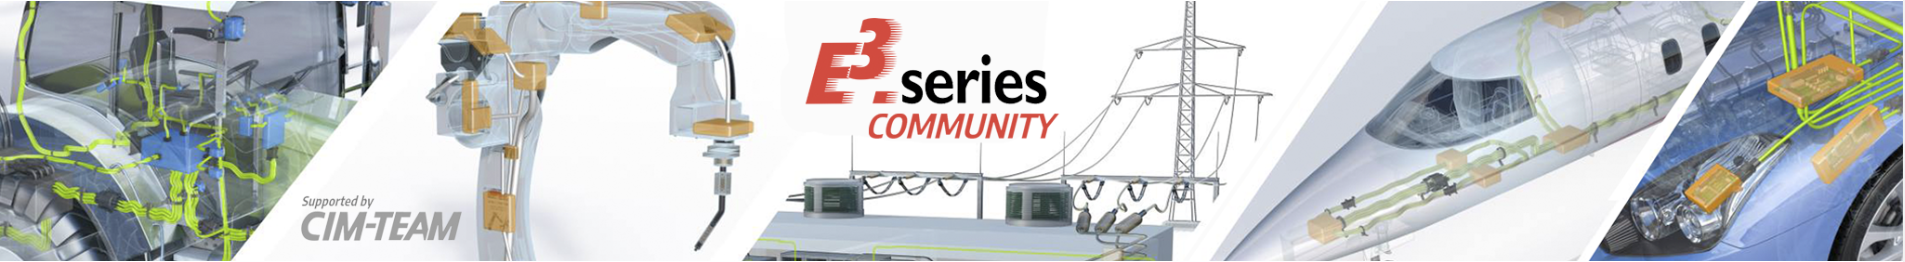 e3seriescommunity